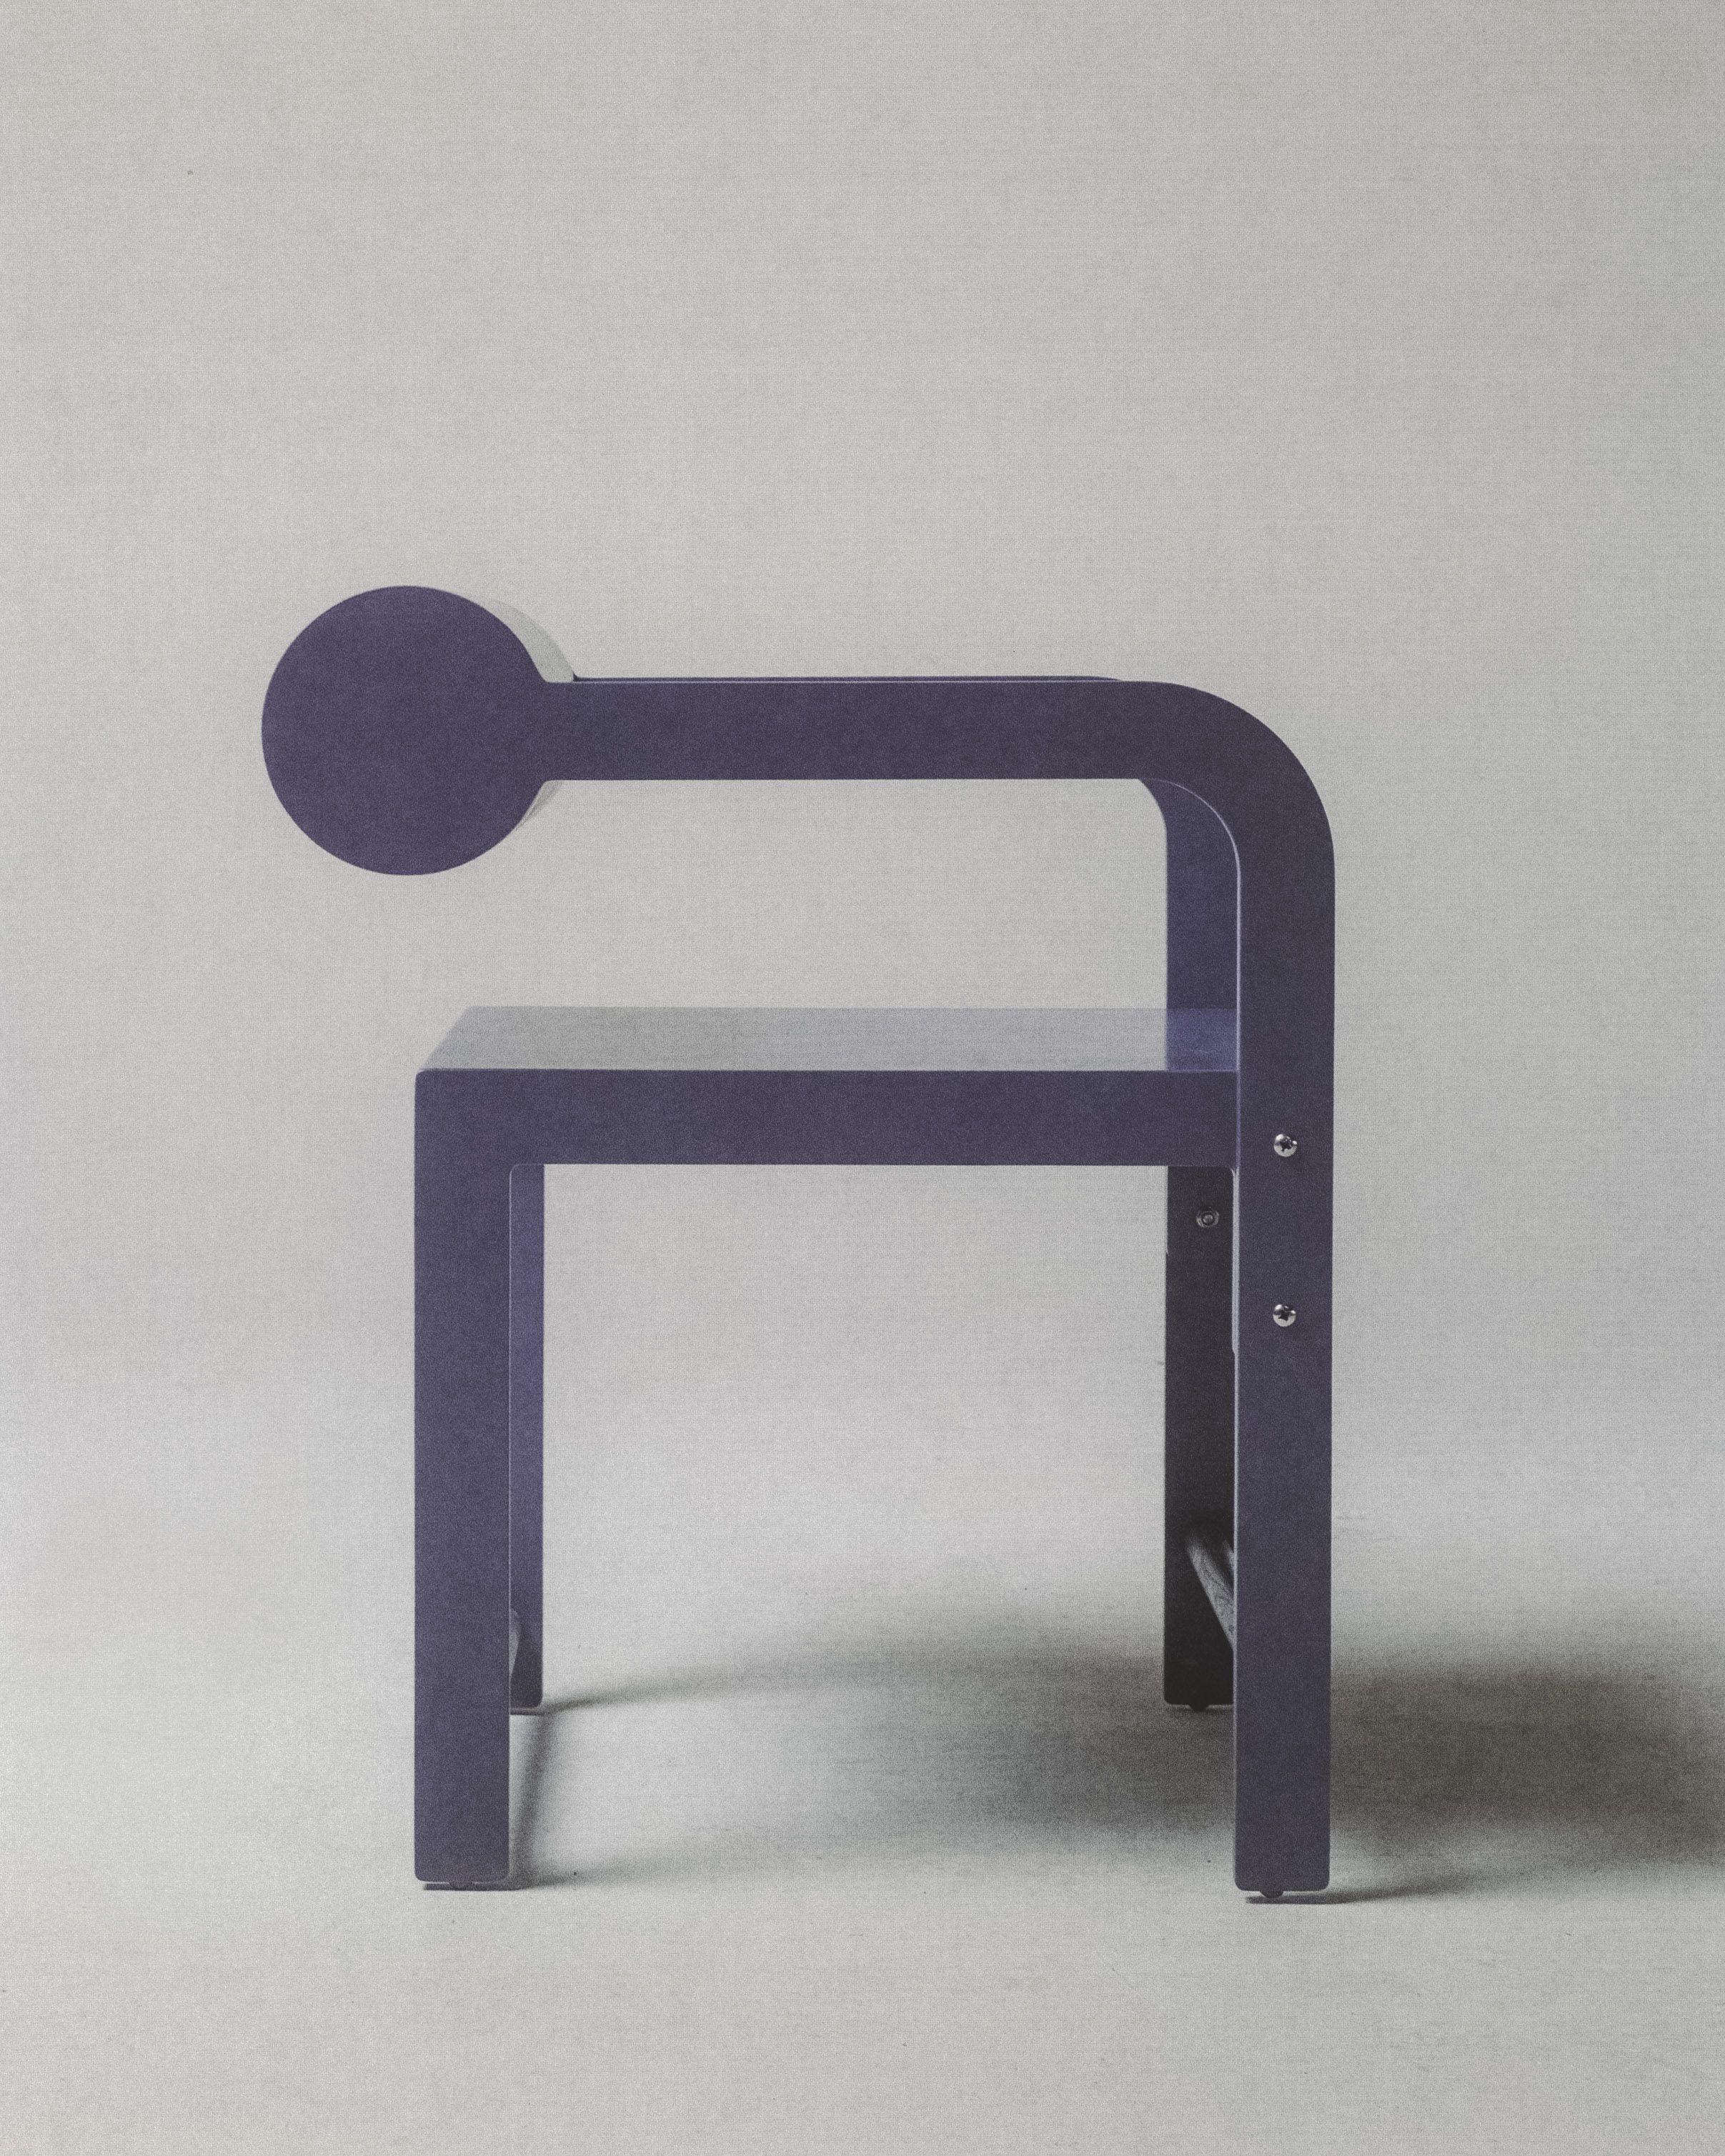 Purple Cylinder Back Arm product image 4